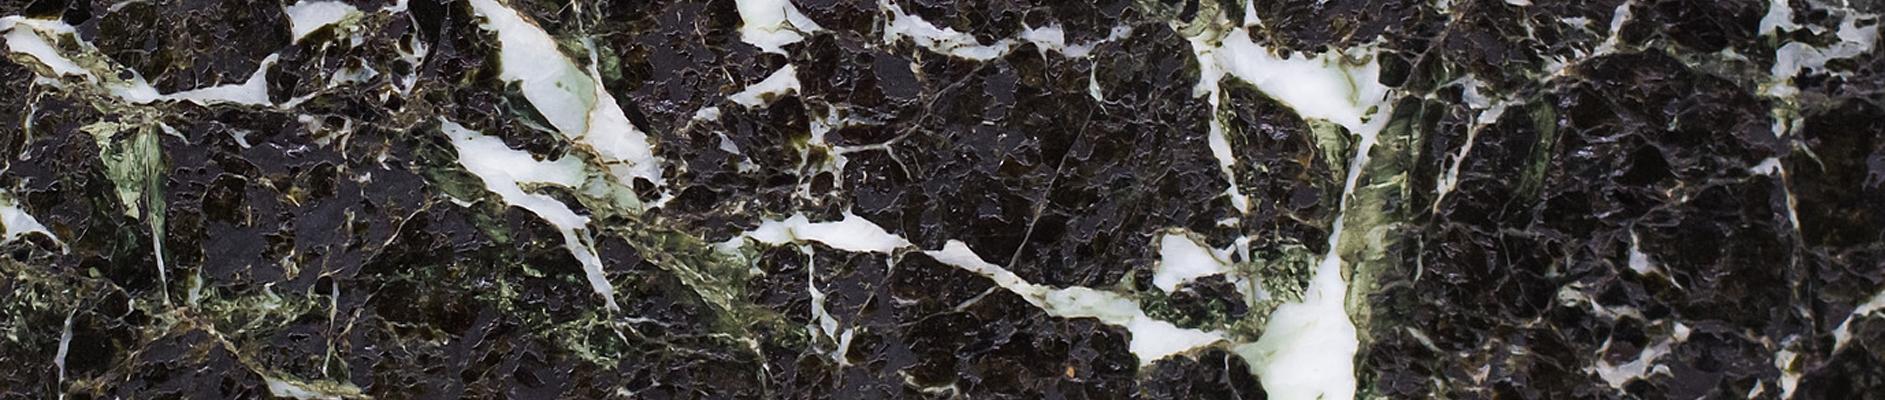 pietra naturale